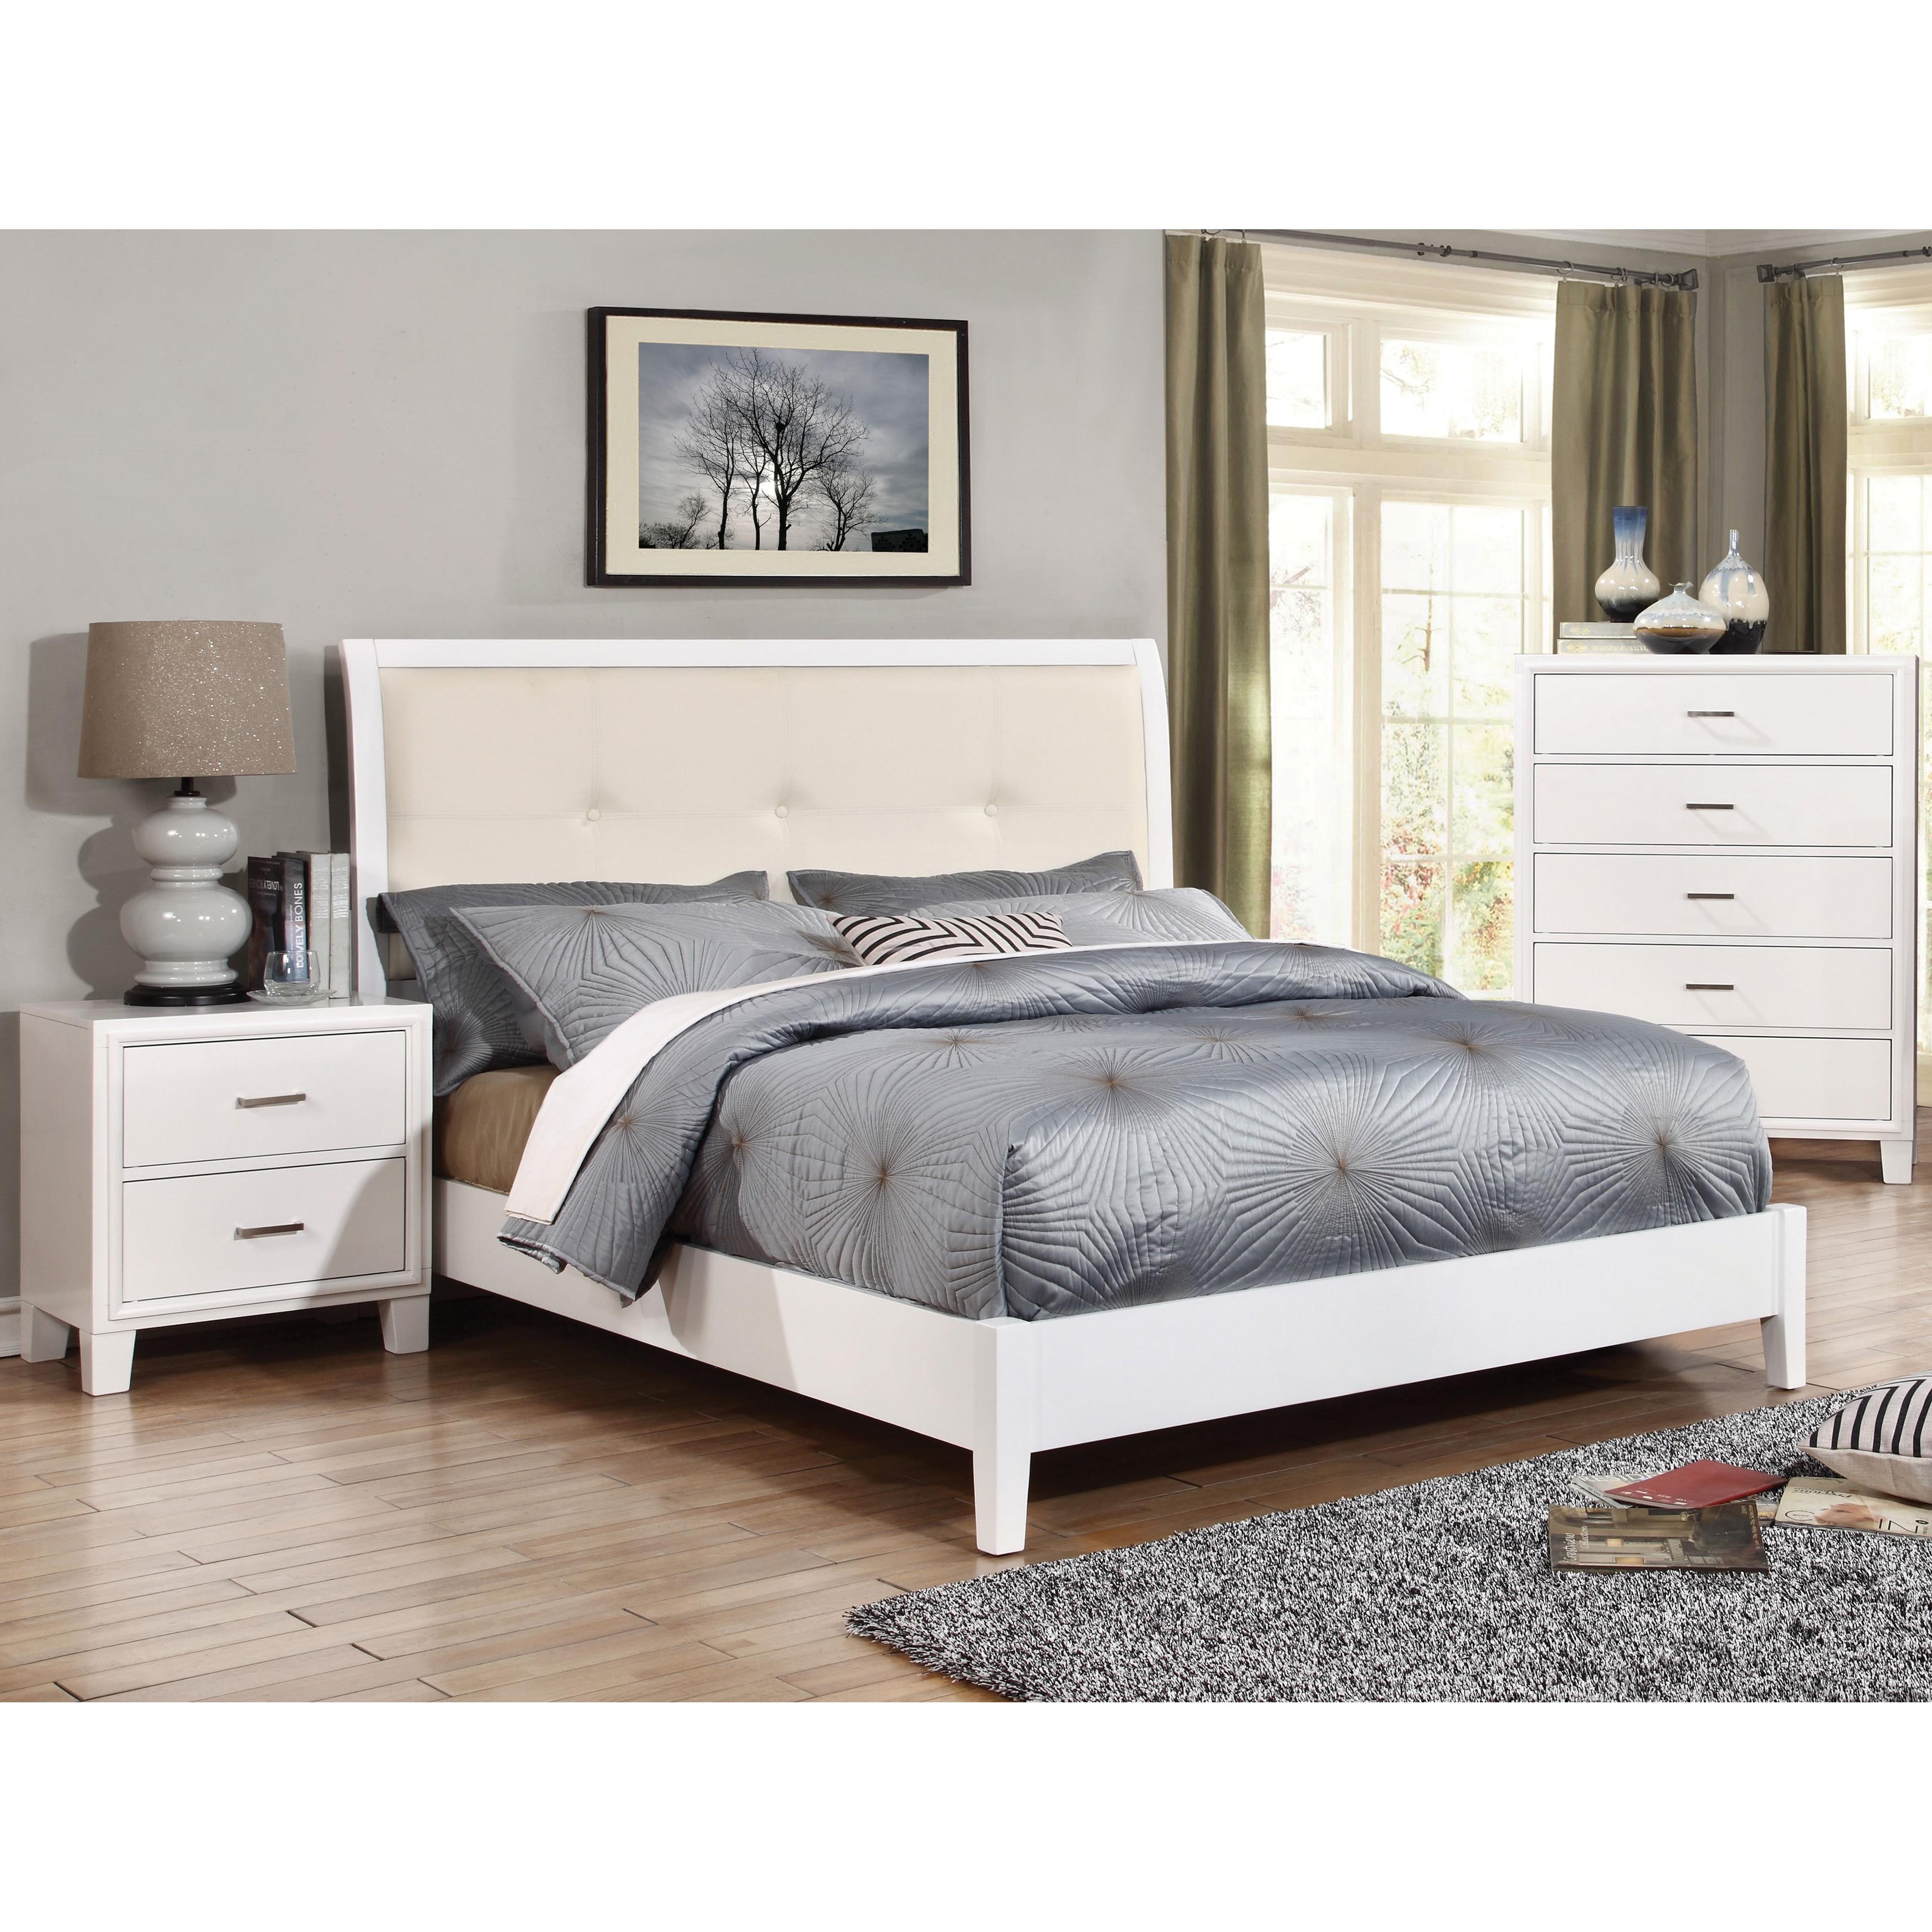 Furniture of America Sunjan White Platform Bed (Queen), B...